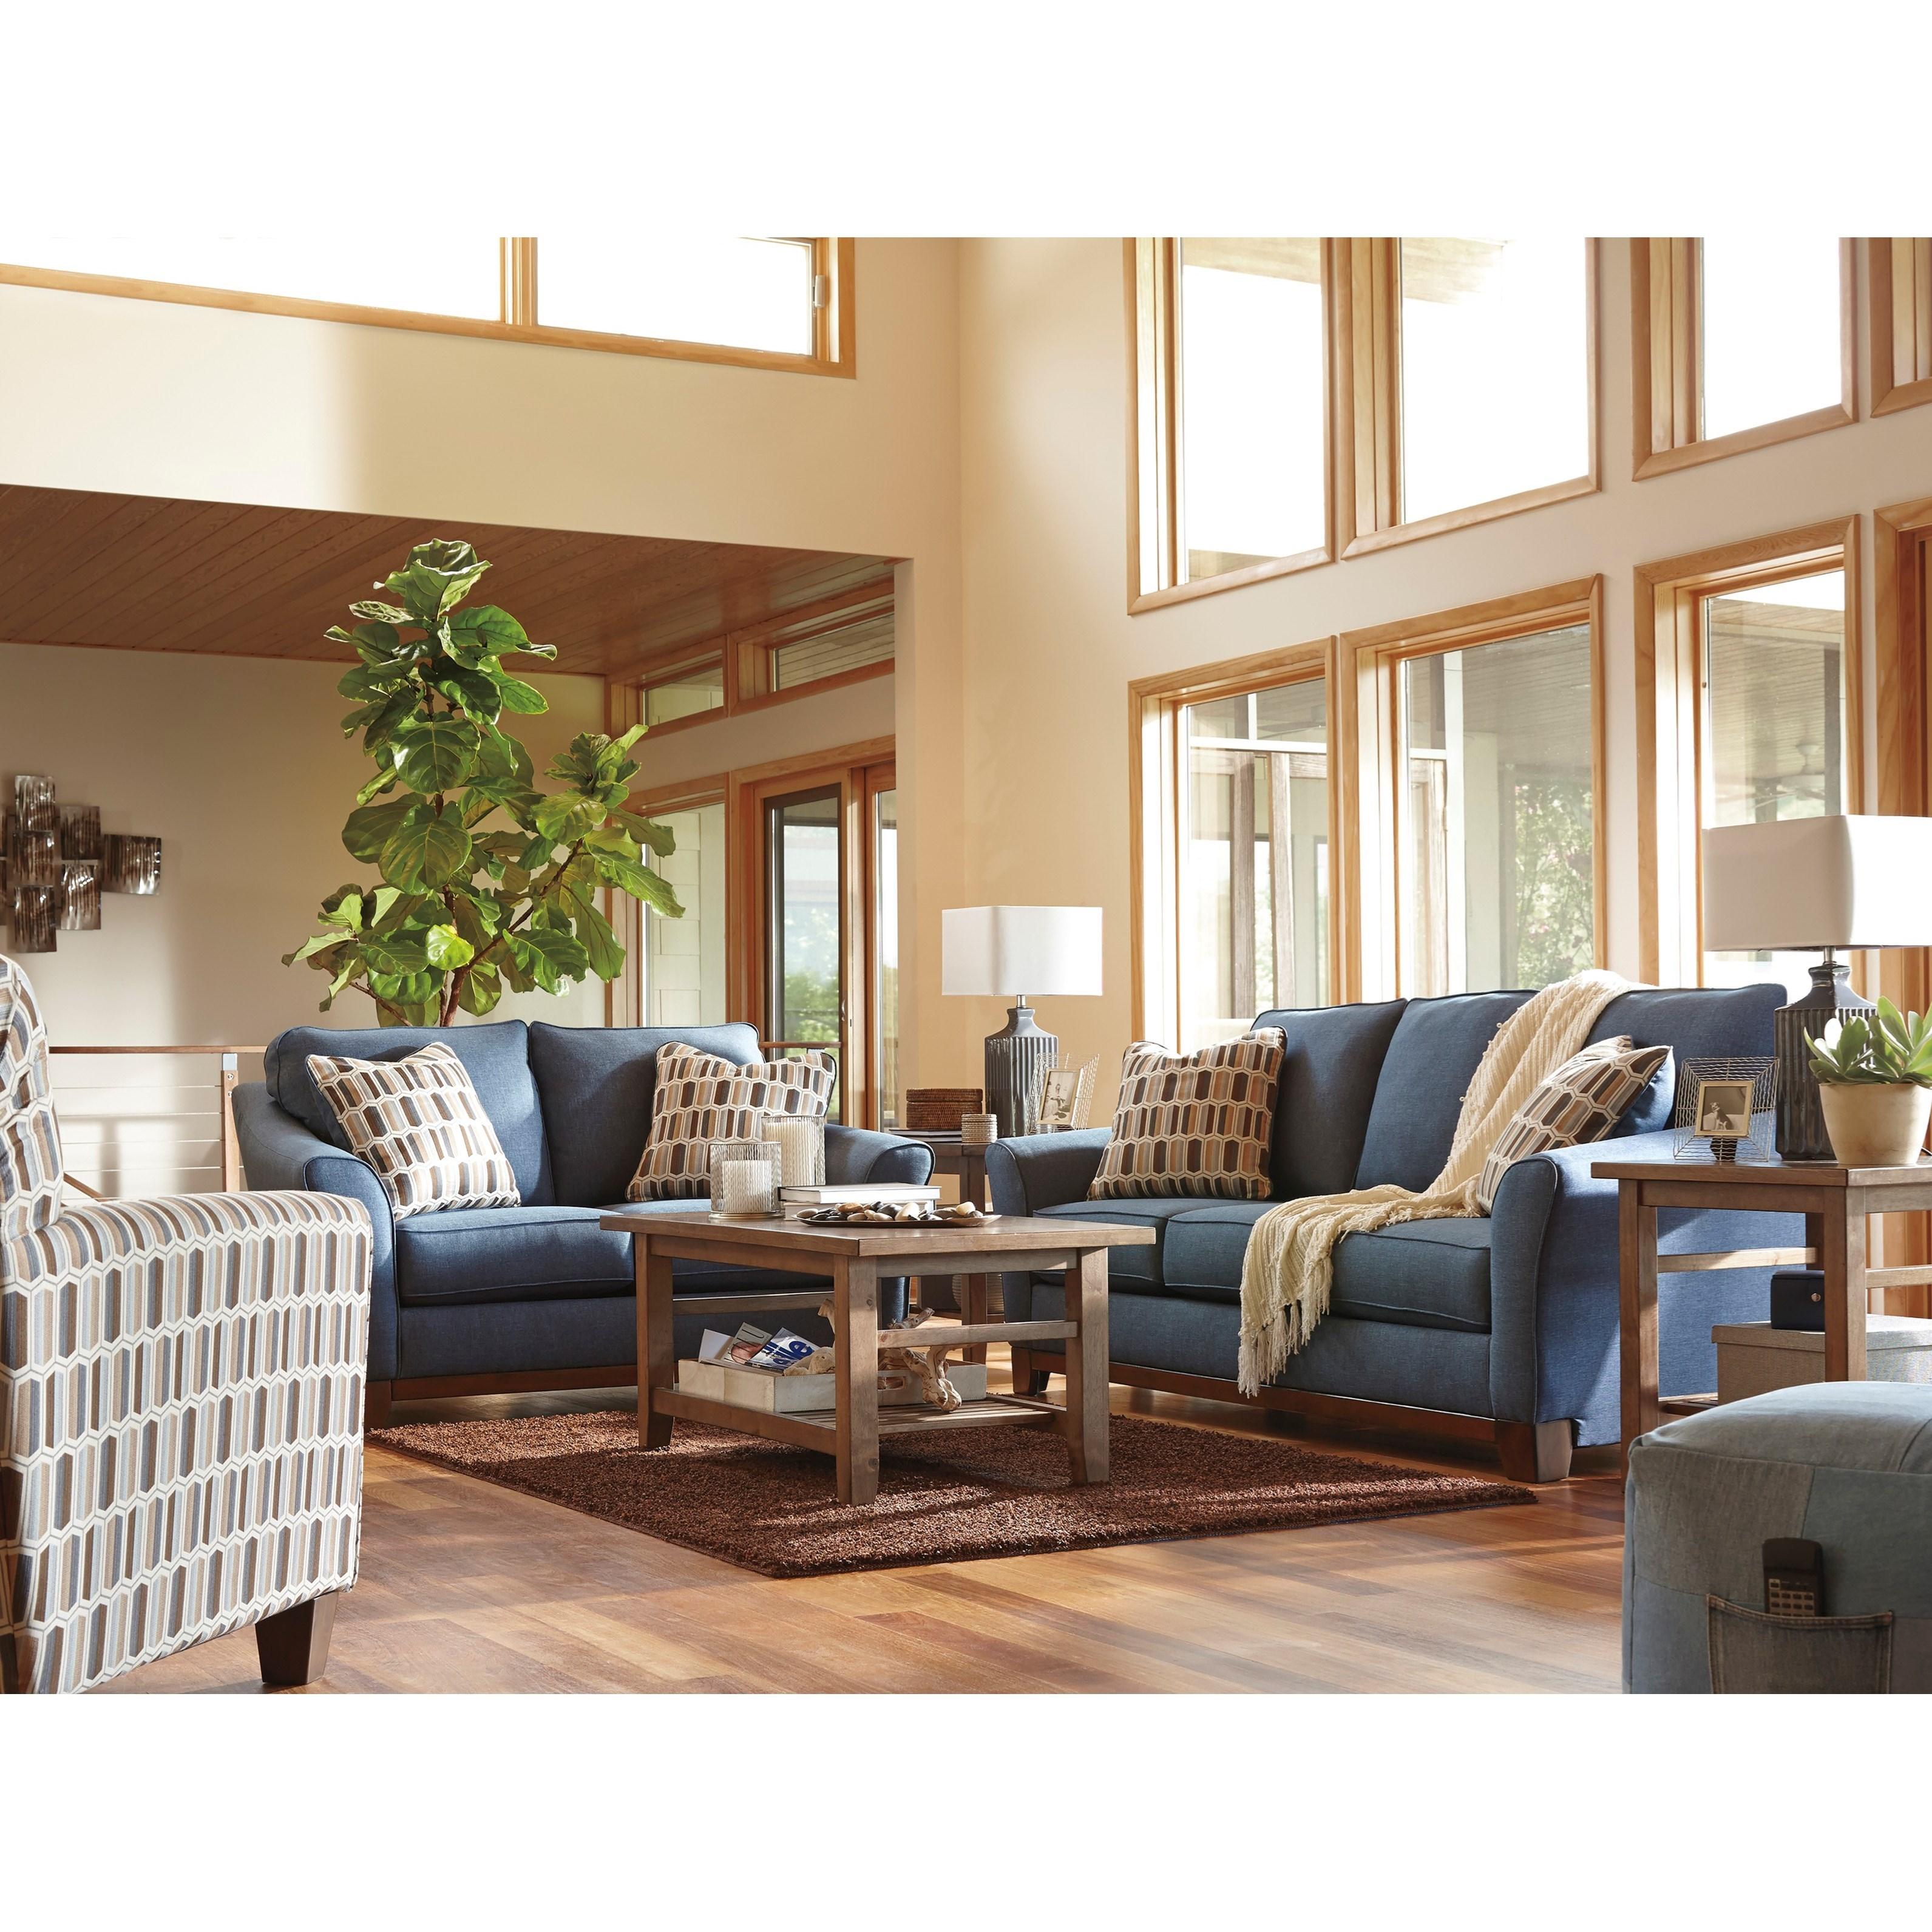 Benchcraft Janley Stationary Living Room Group - Item Number: 43807 Living Room Group 2